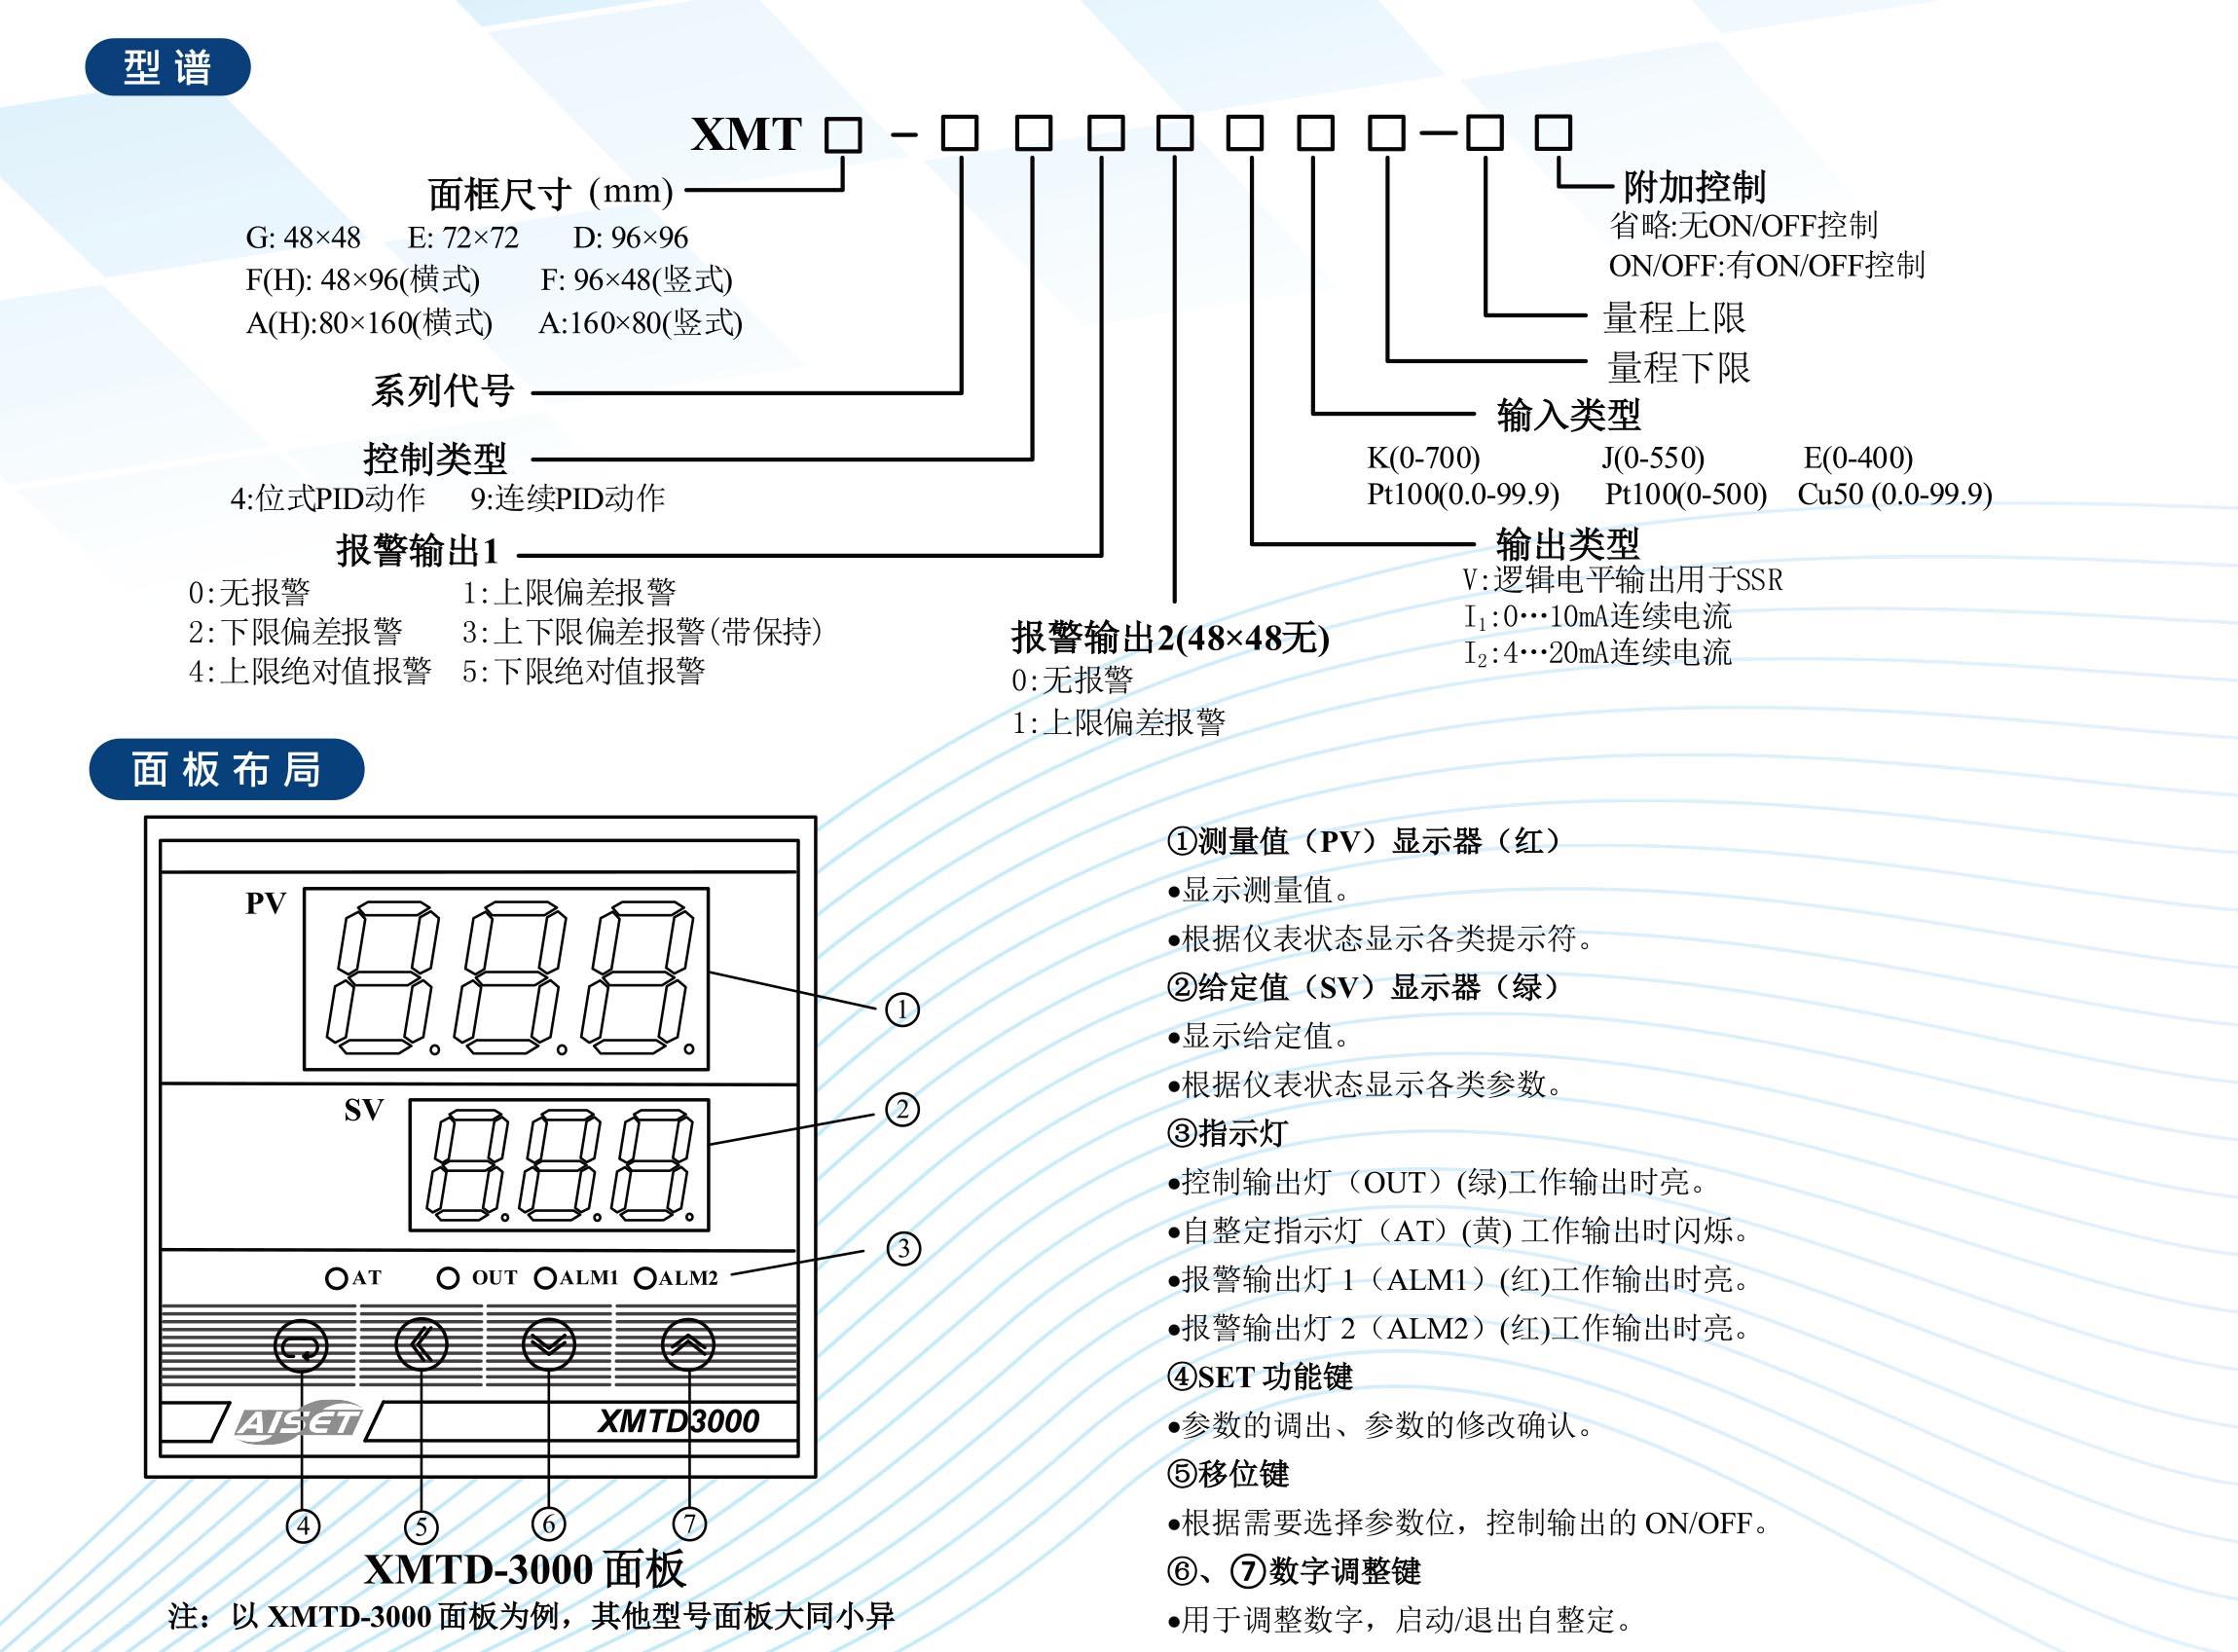 xmt-3000-智能数字显示温度控制器-上海亚泰仪表有限